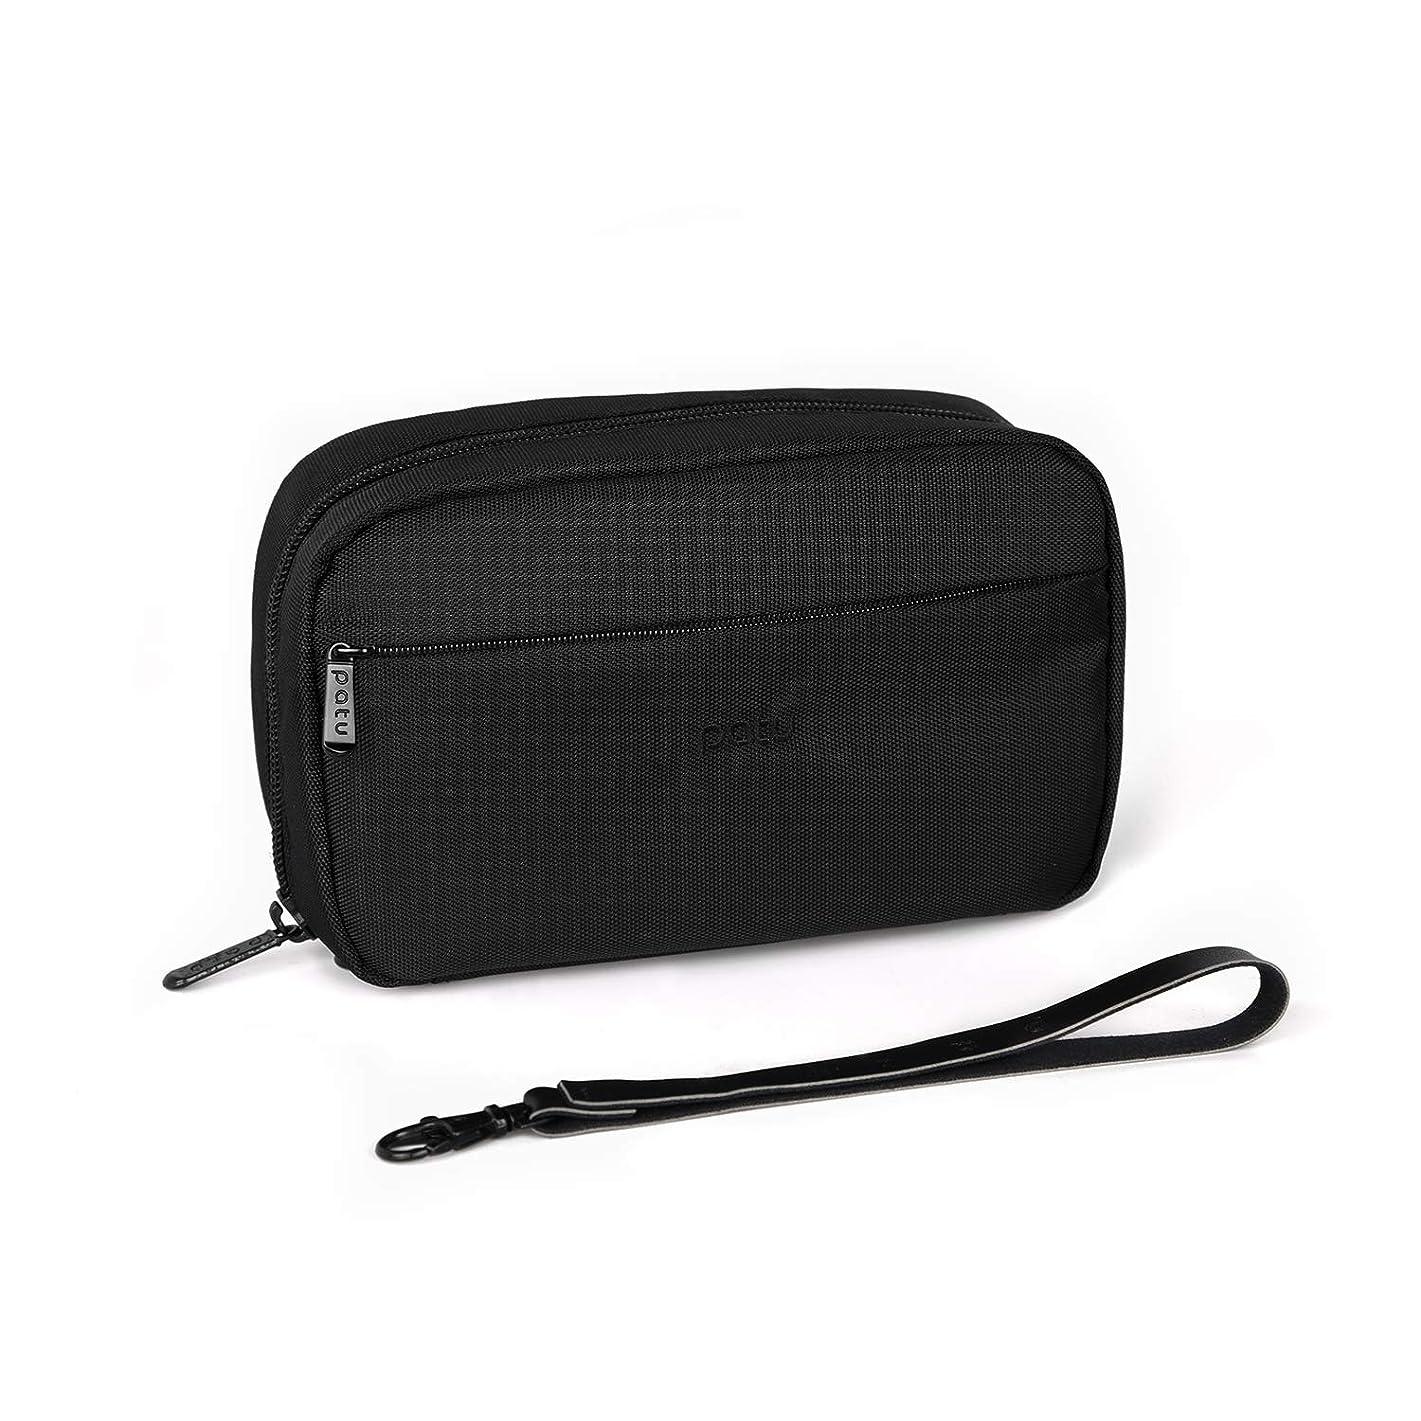 Patu Handy Beauty Stuff Carry Case, Makeup Cosmetic Bag, Women Facial Cleanser Skincare Kit Pouch, Pencil Clutch, Portable Electronics Accessories Organizer, Black